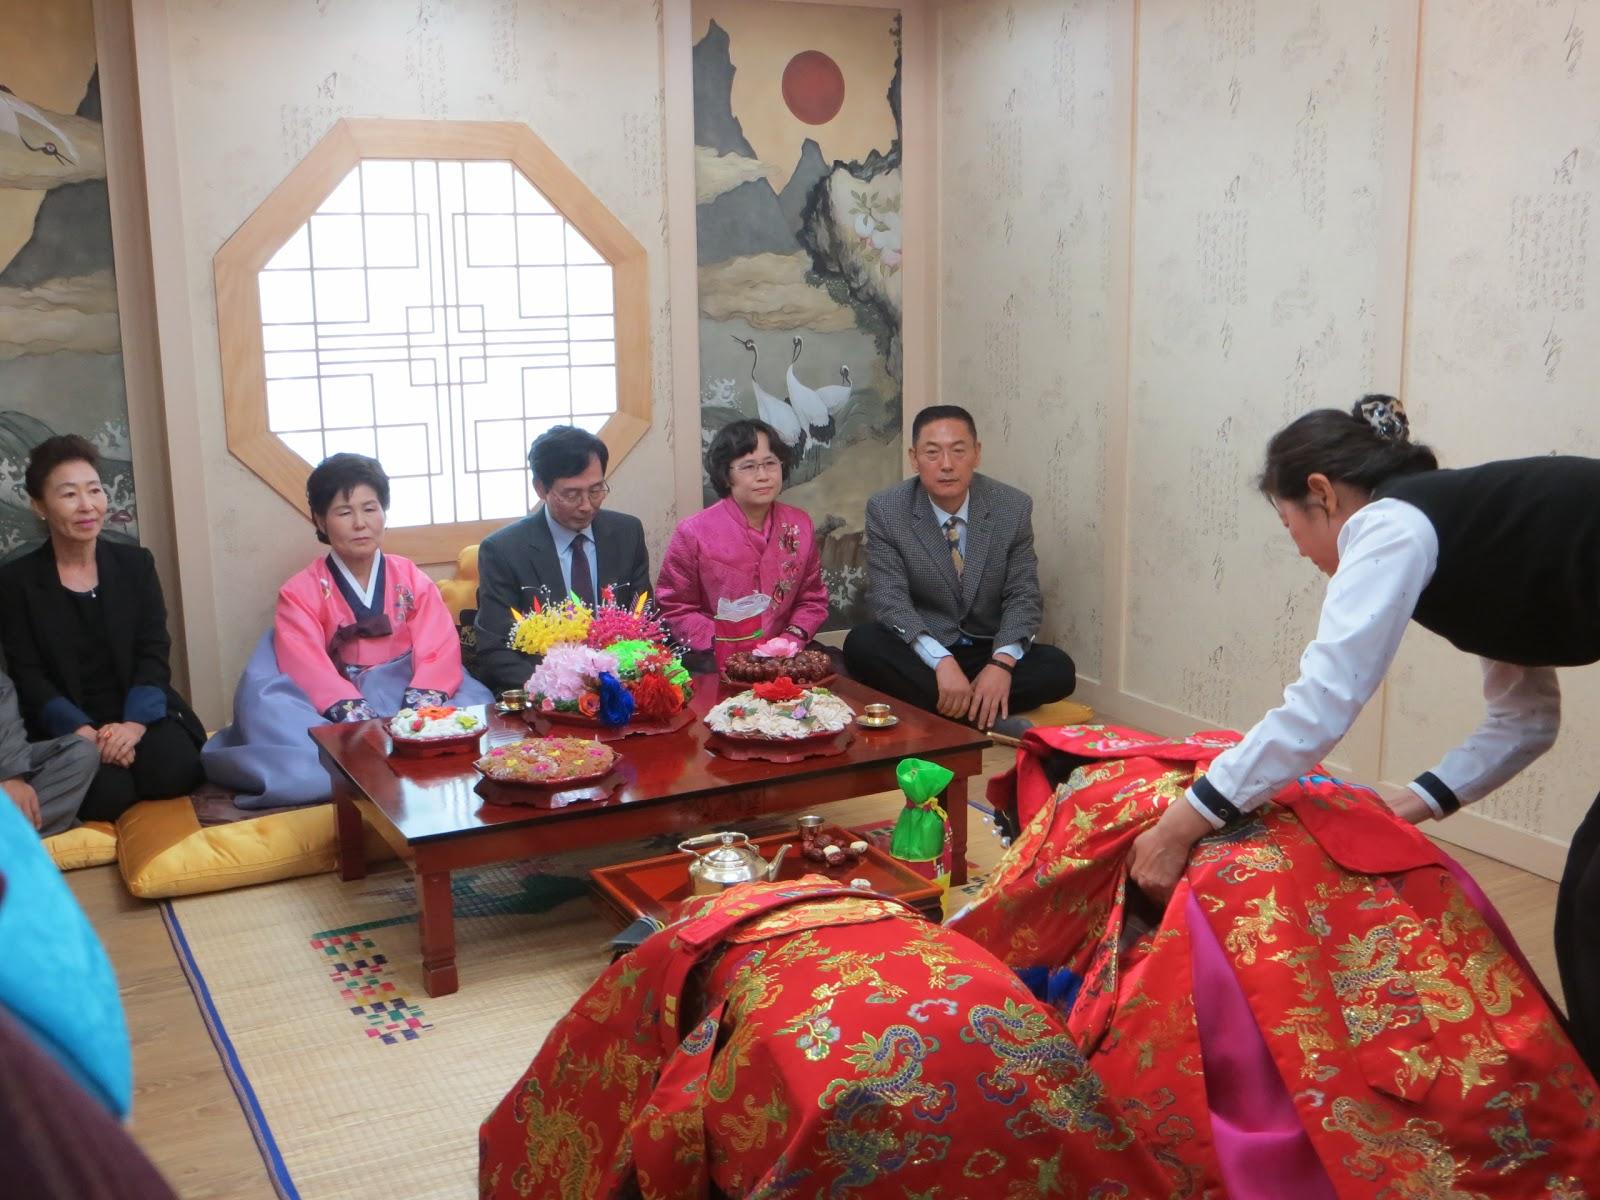 GDay Korea Korean Wedding Cultural Differences